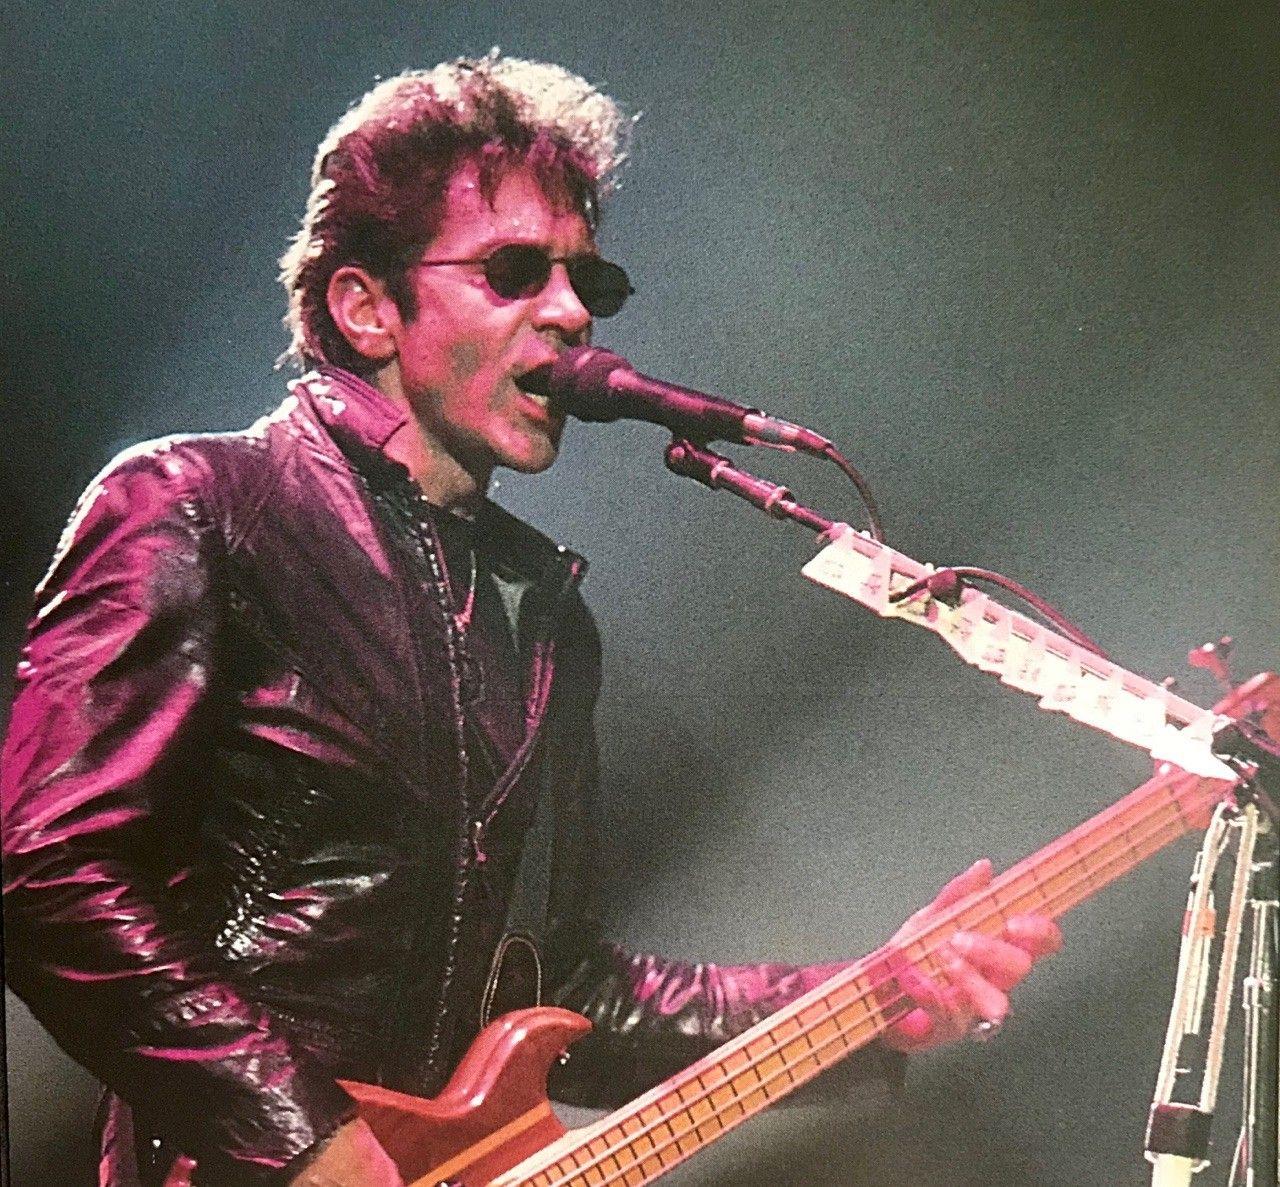 En 1951 nació Alec Jhon Such, bajista de Bon Jovi hasta 1994